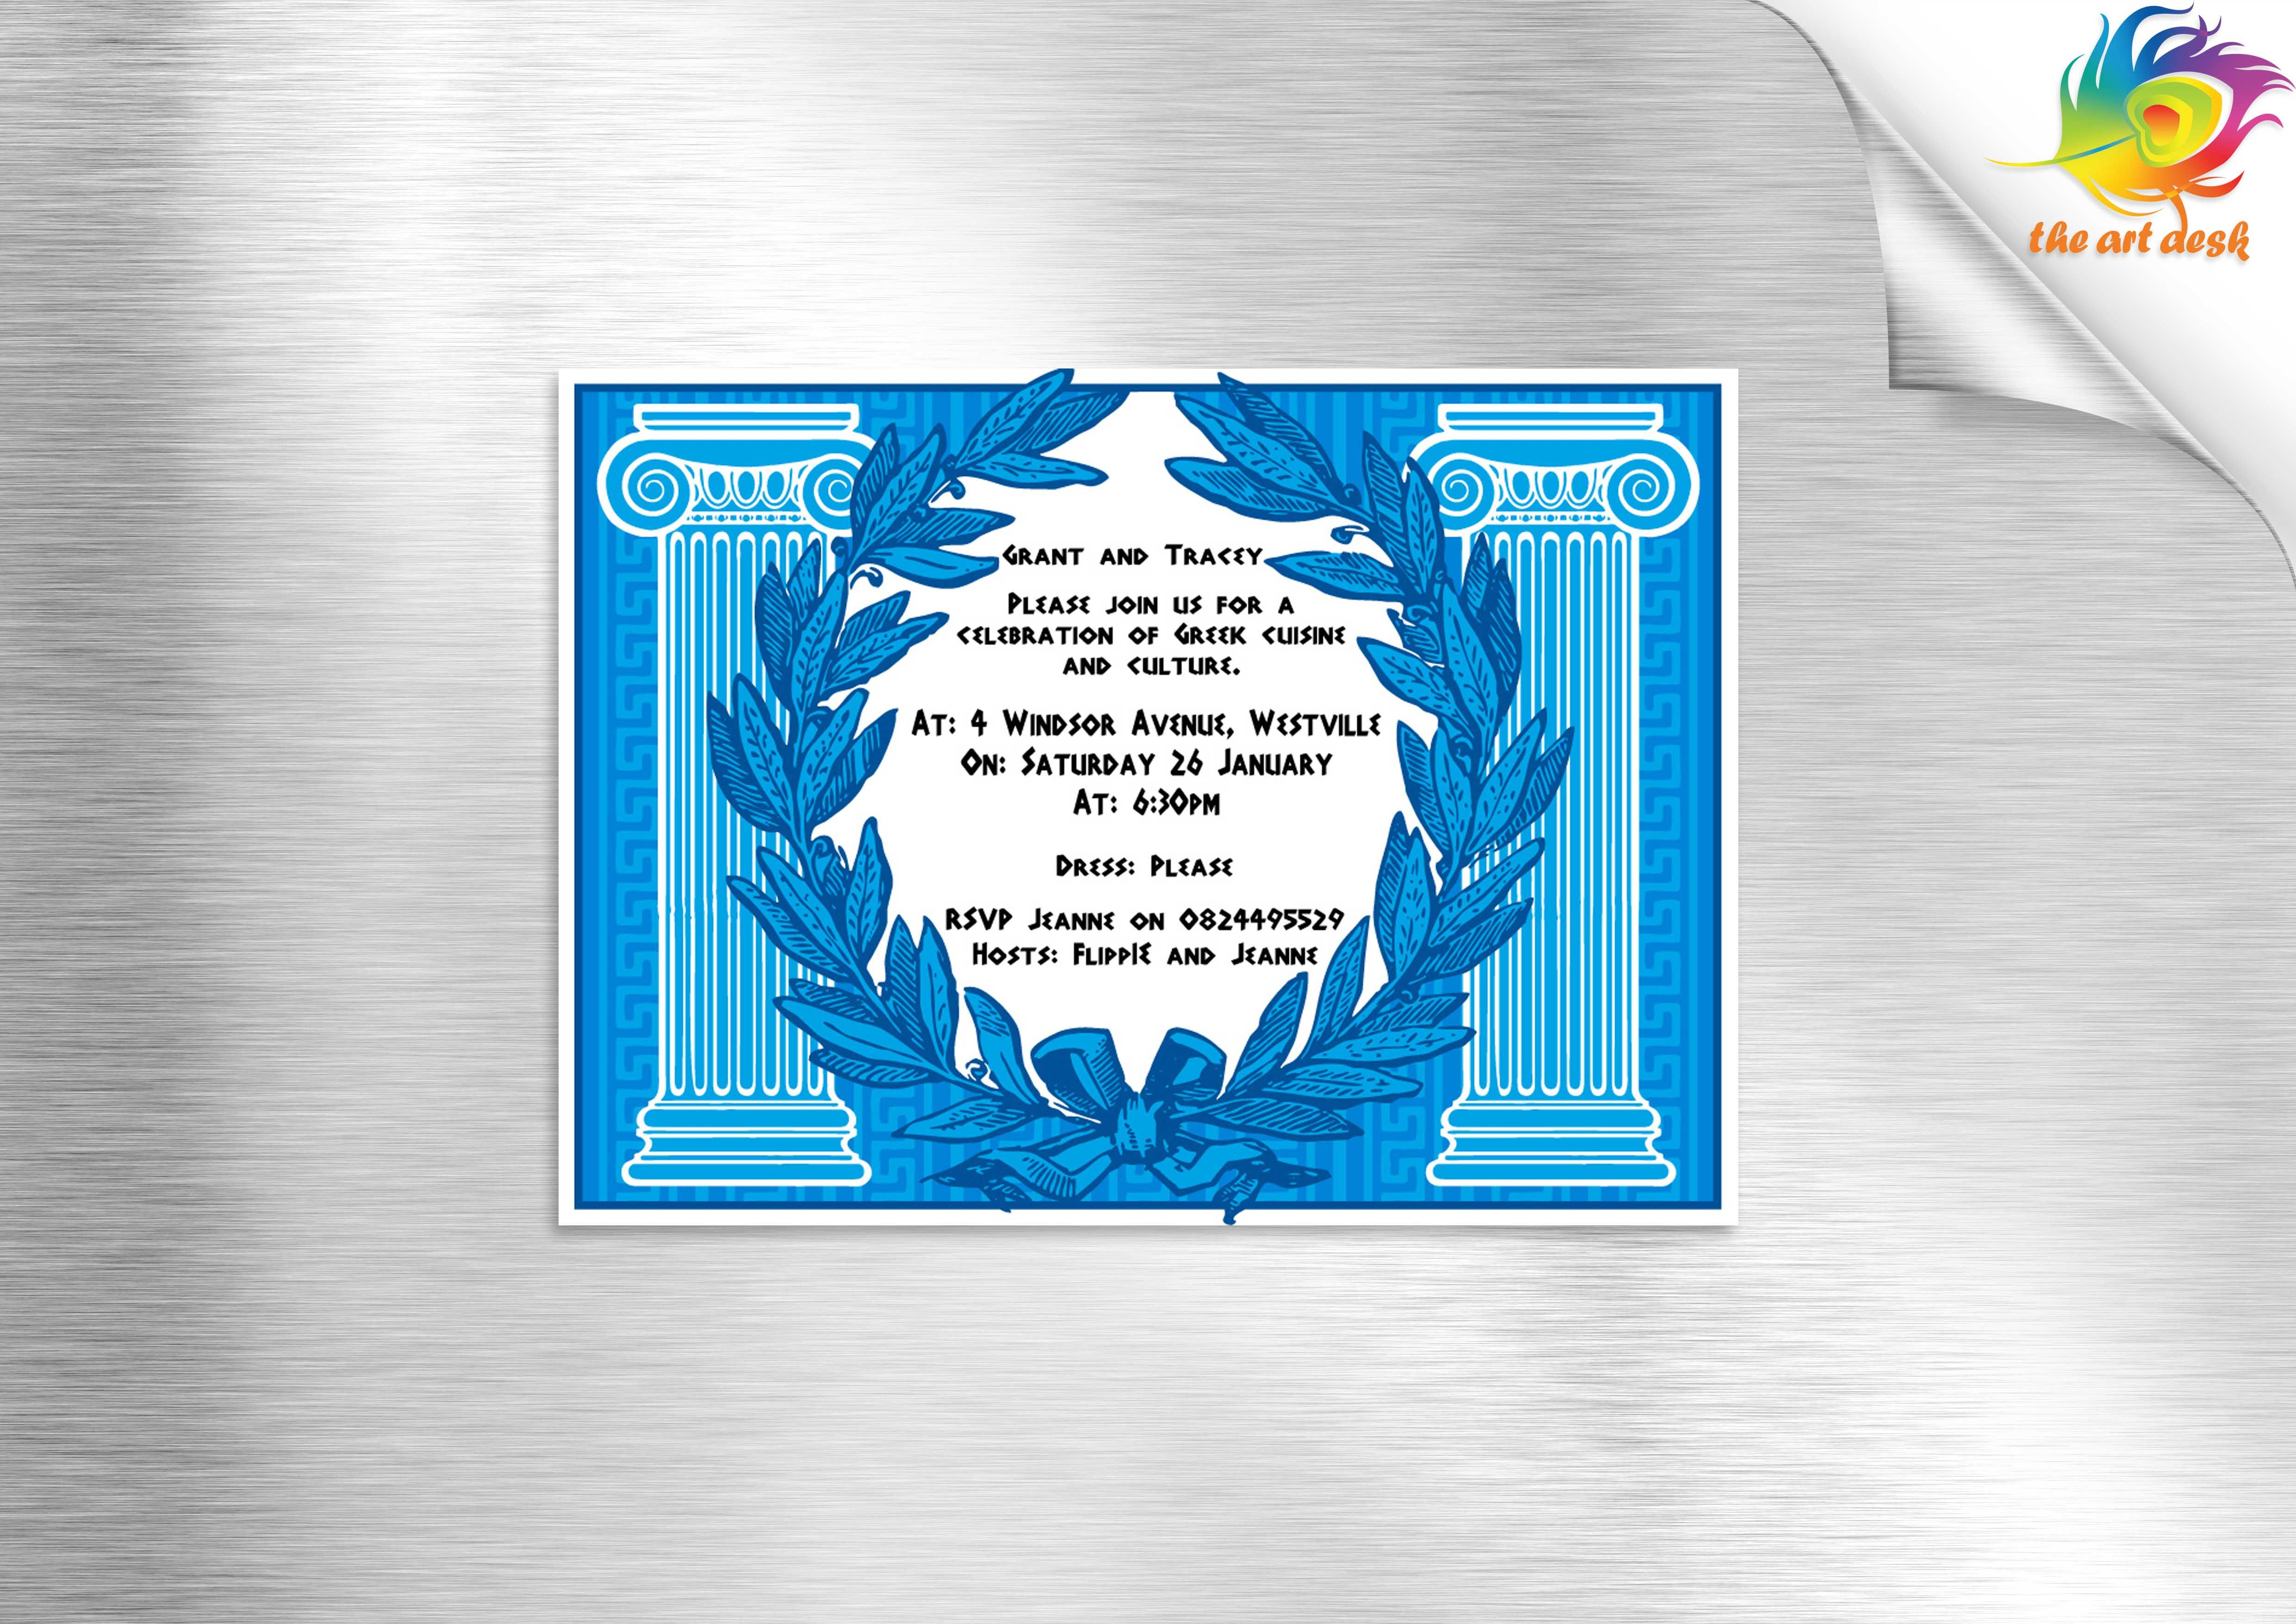 Dinner party invitation - Greek theme